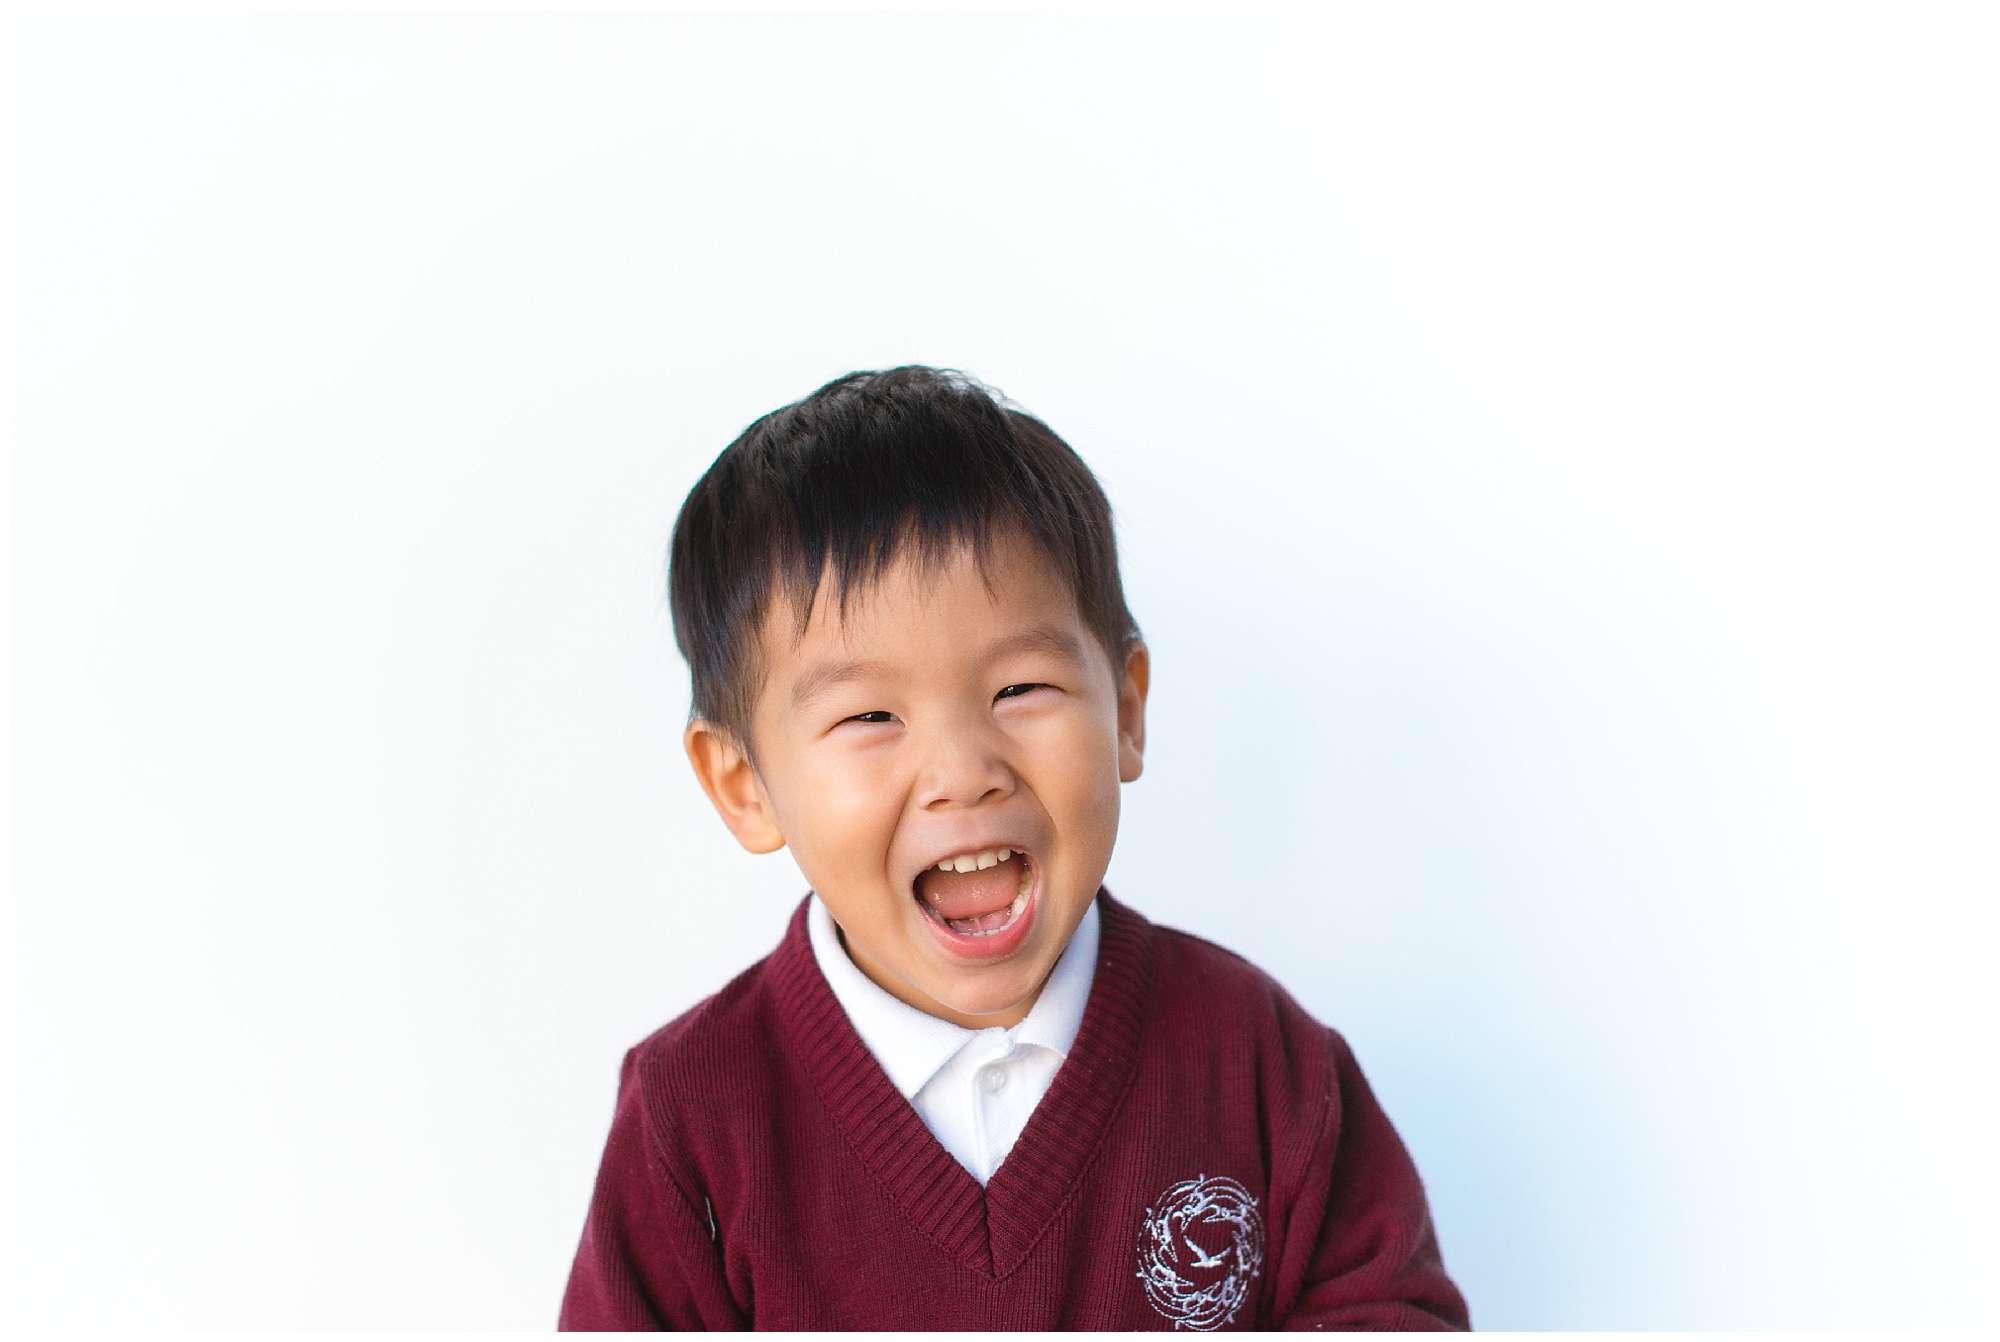 Modern School Photography